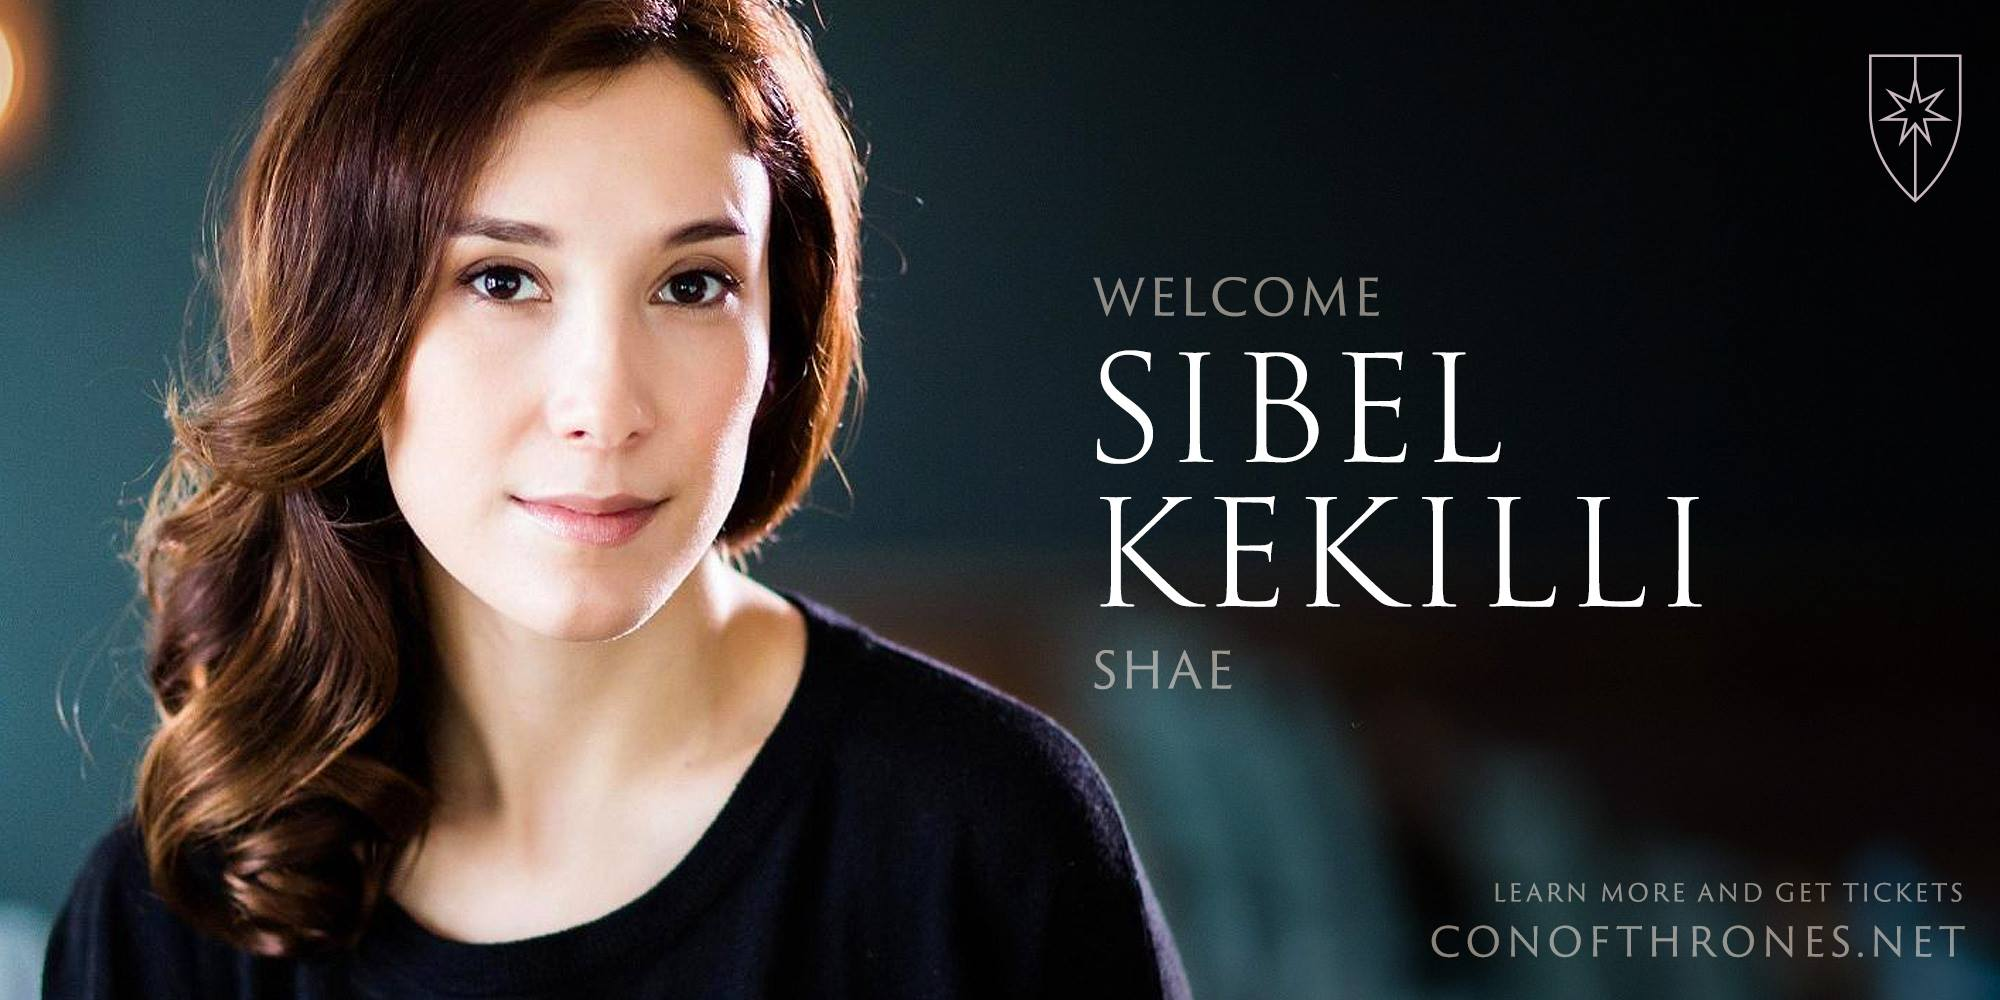 Sibel Kekilli photos